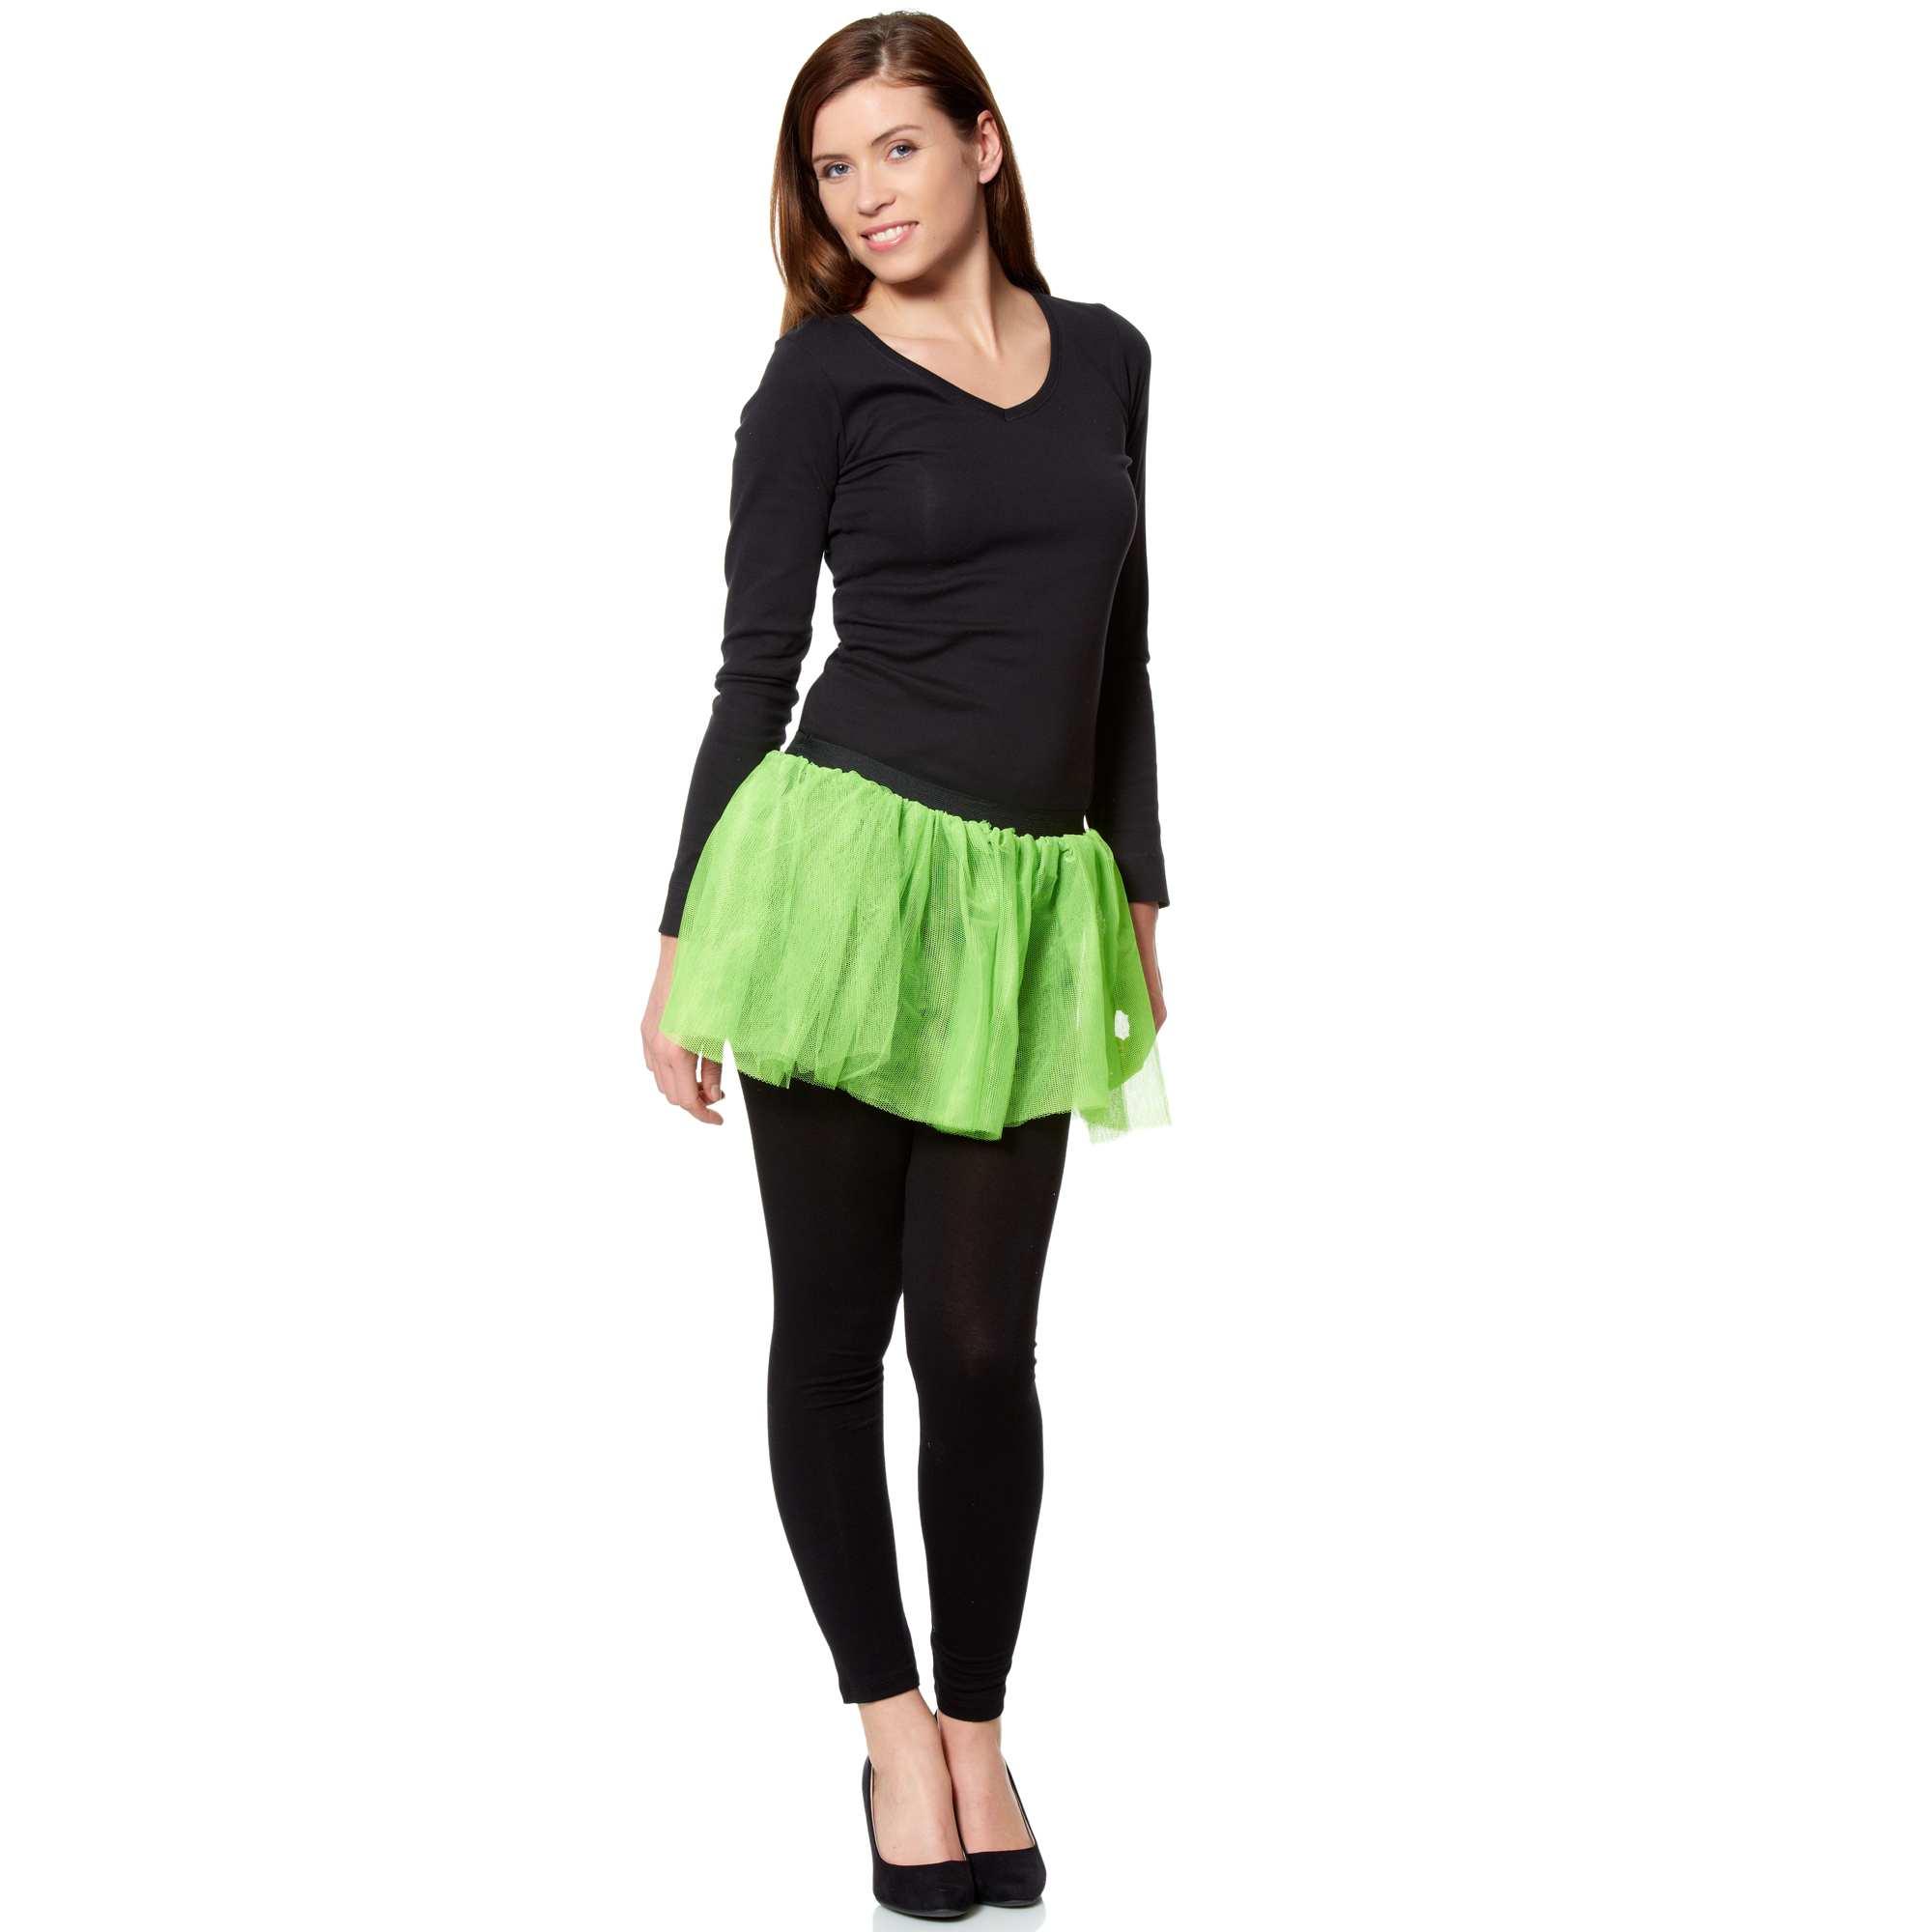 jupe tutu flashy femme vert fluo kiabi 8 00. Black Bedroom Furniture Sets. Home Design Ideas